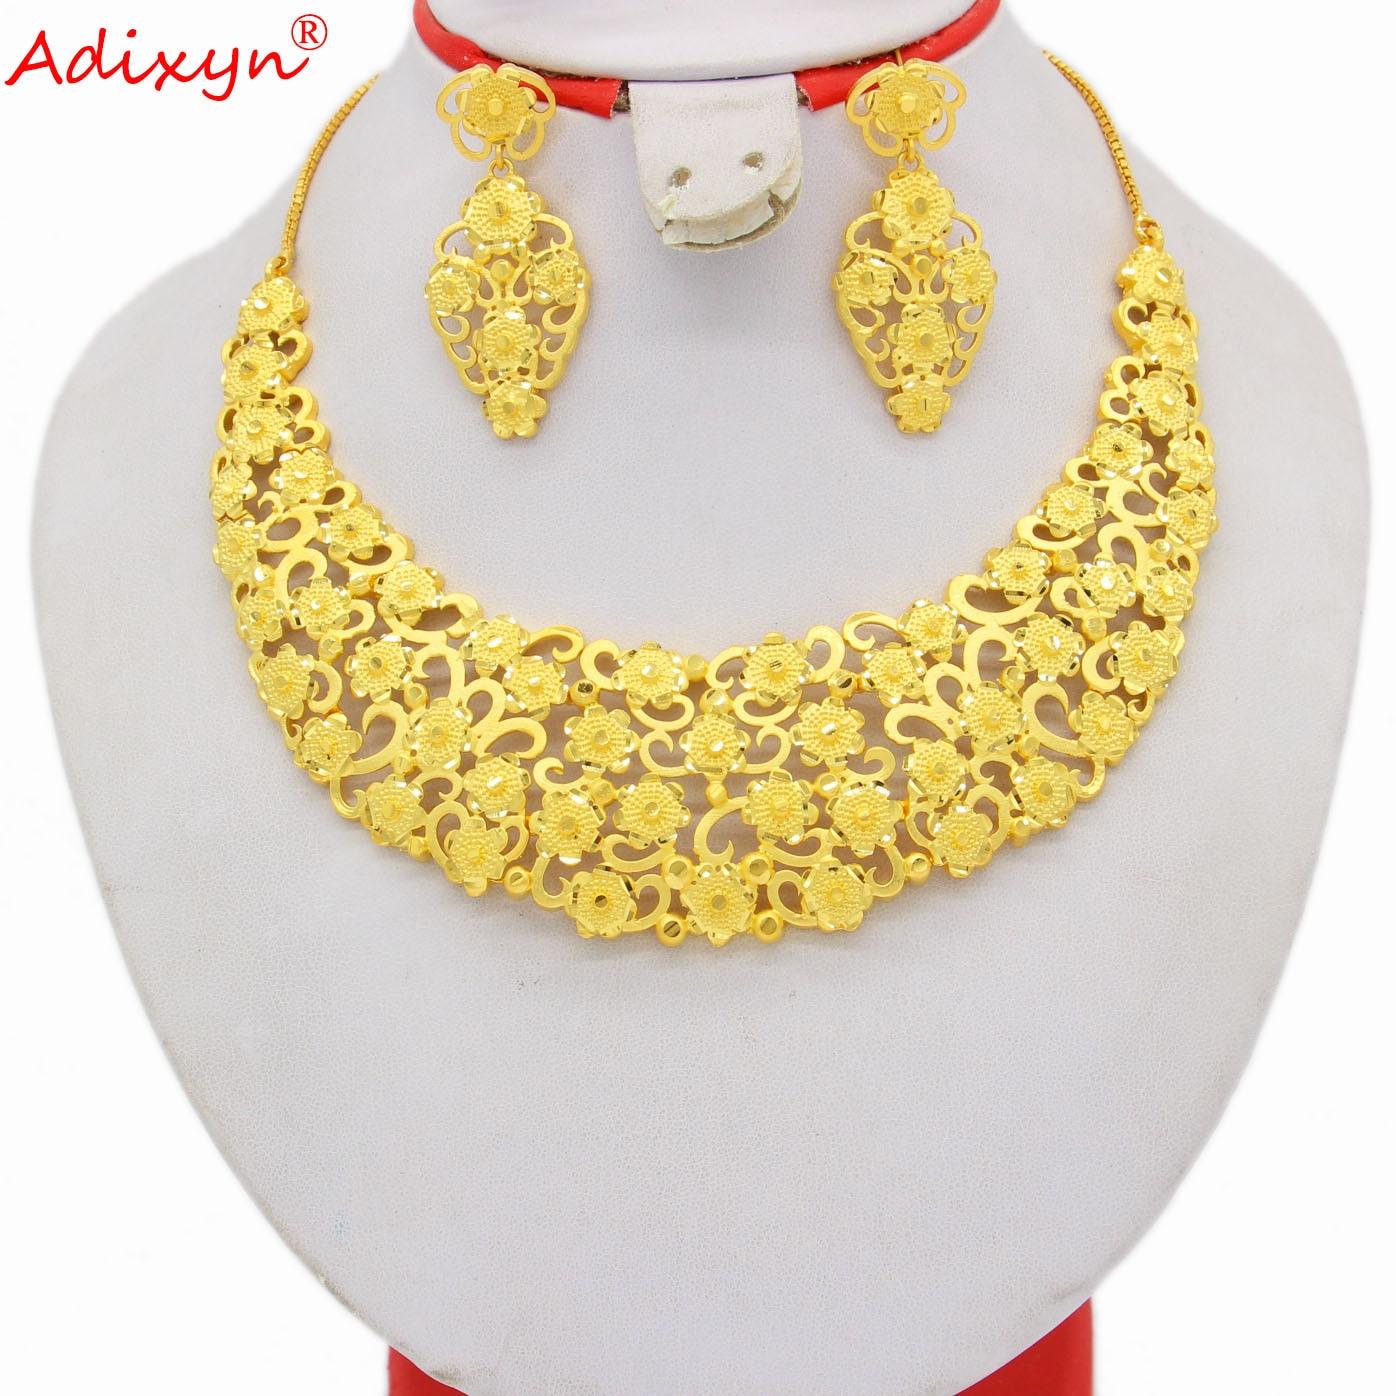 Adixyn 24K Gold Color Dubai Women Necklace Earrings Jewelry Set African Arab Wedding Bridal Saudi Gifts N04073